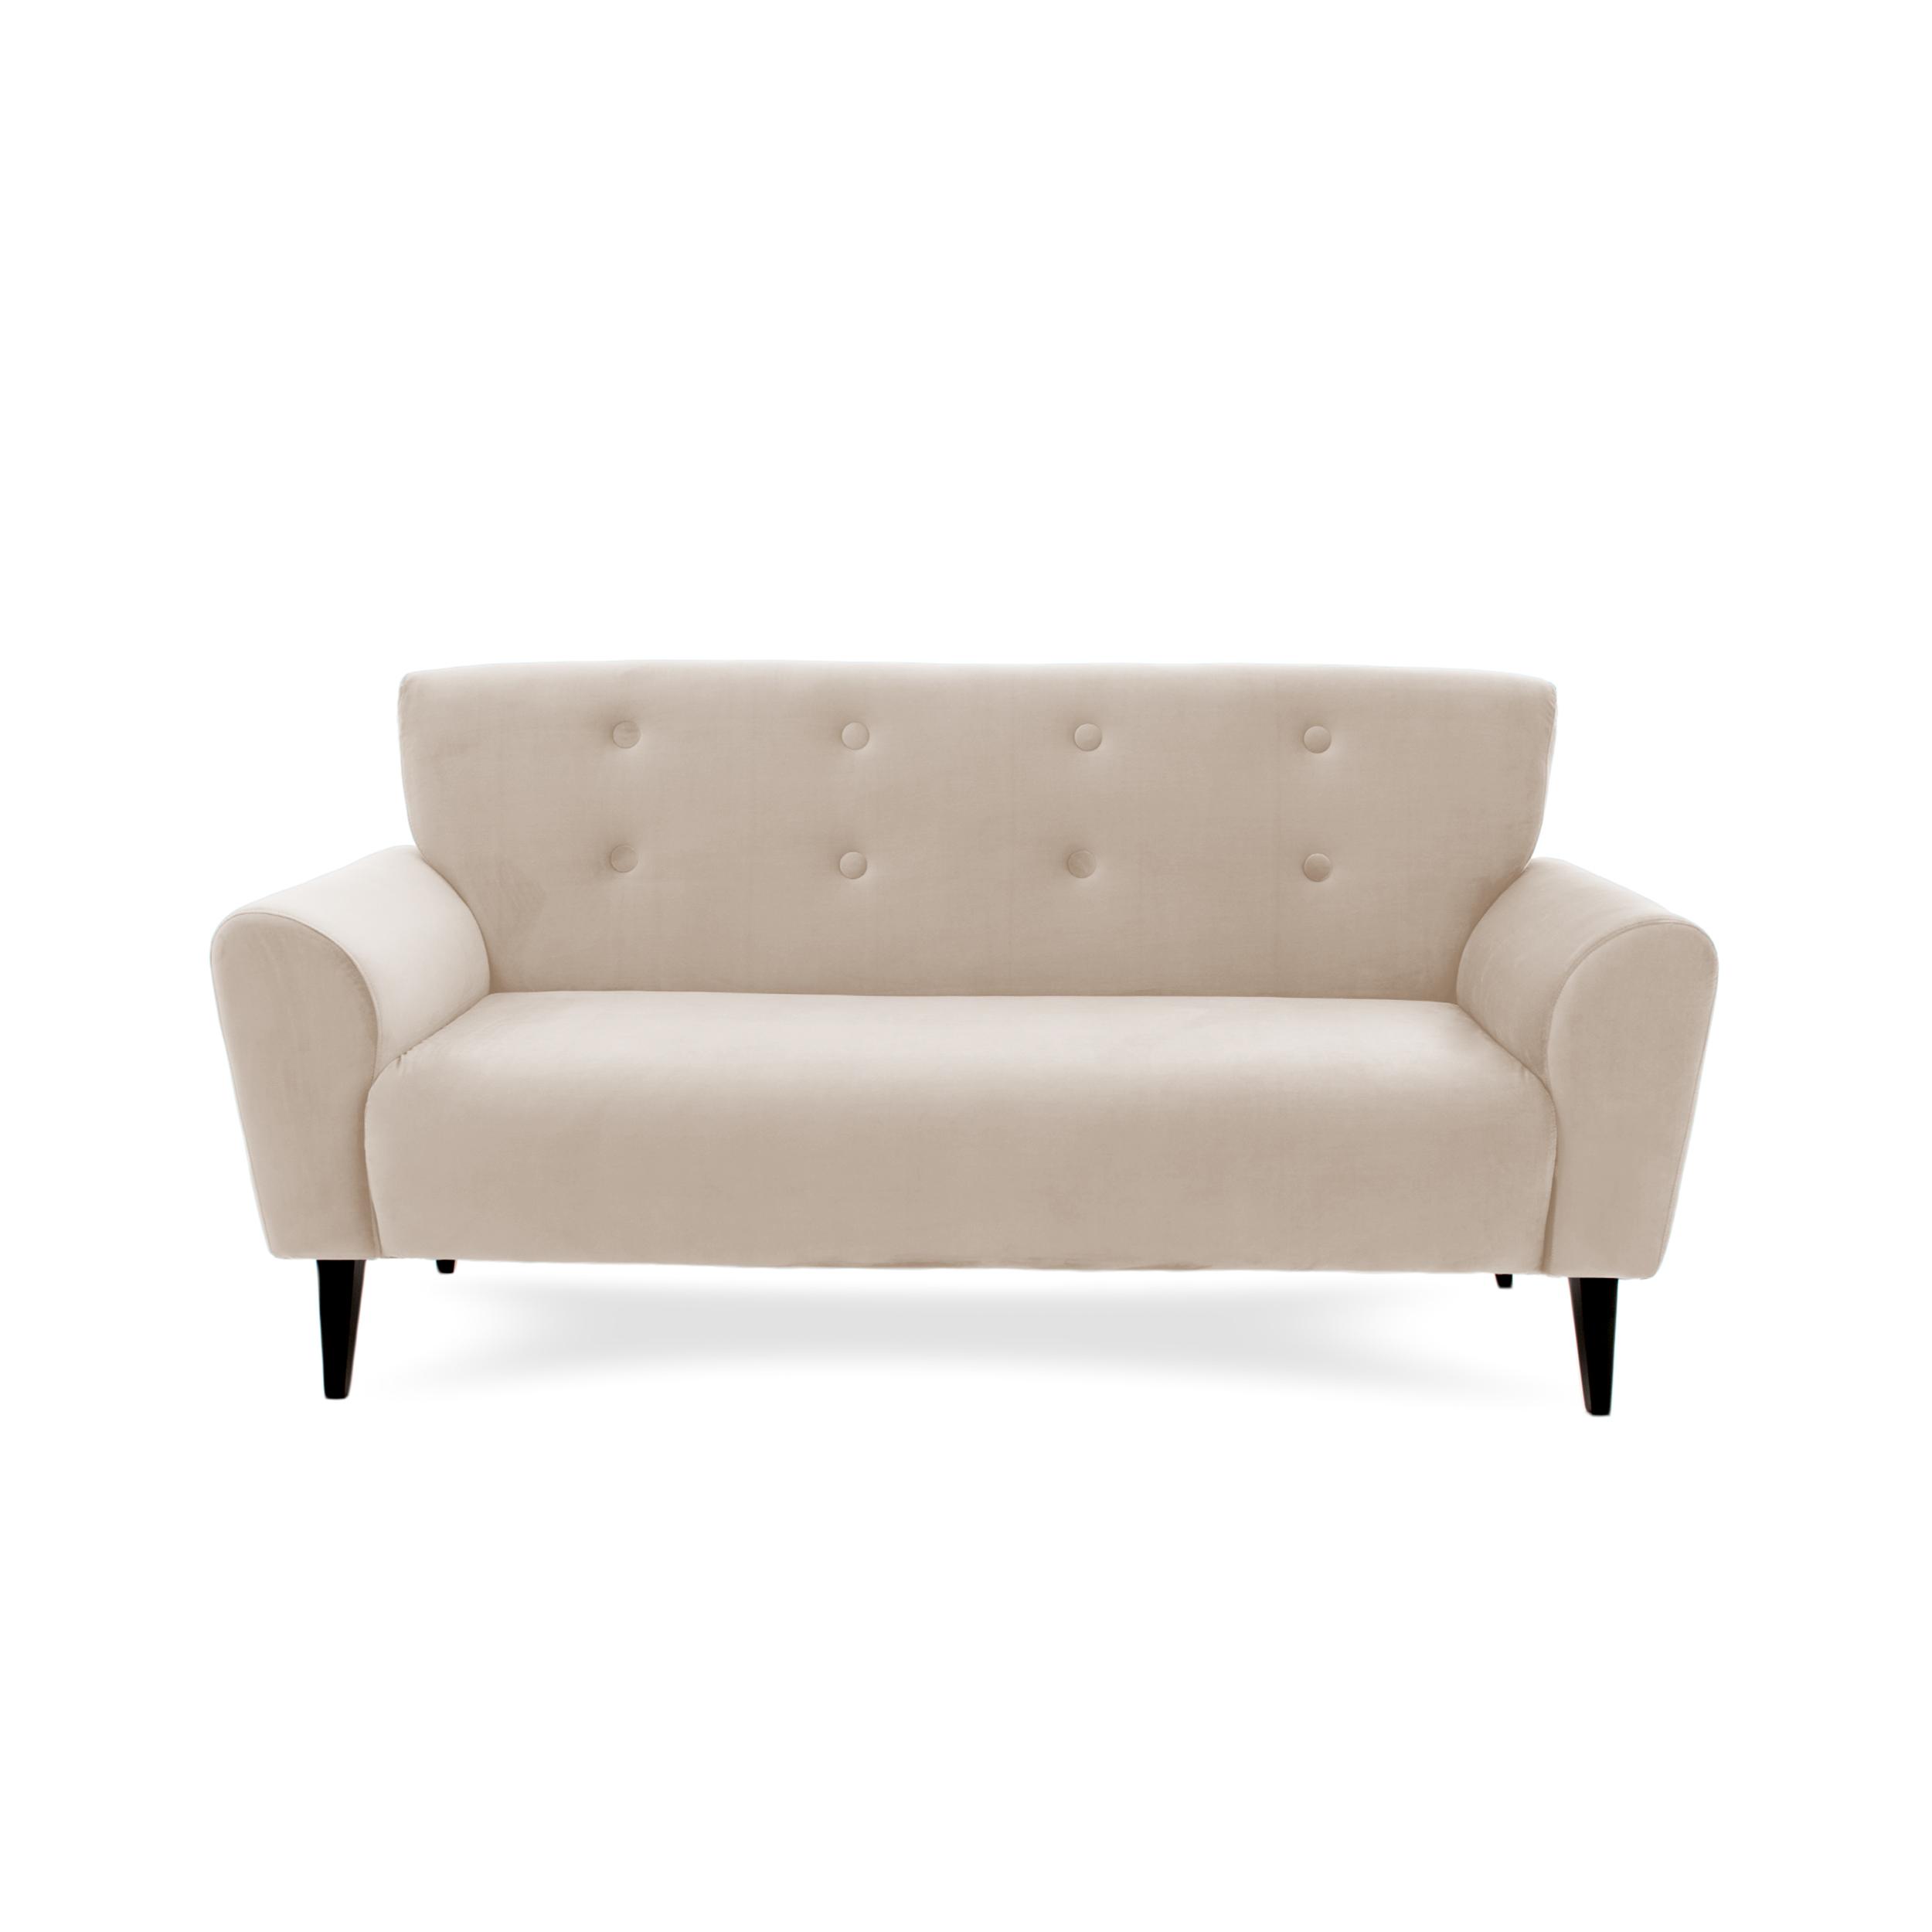 Canapea Fixa 3 locuri Kiara Silky Grey